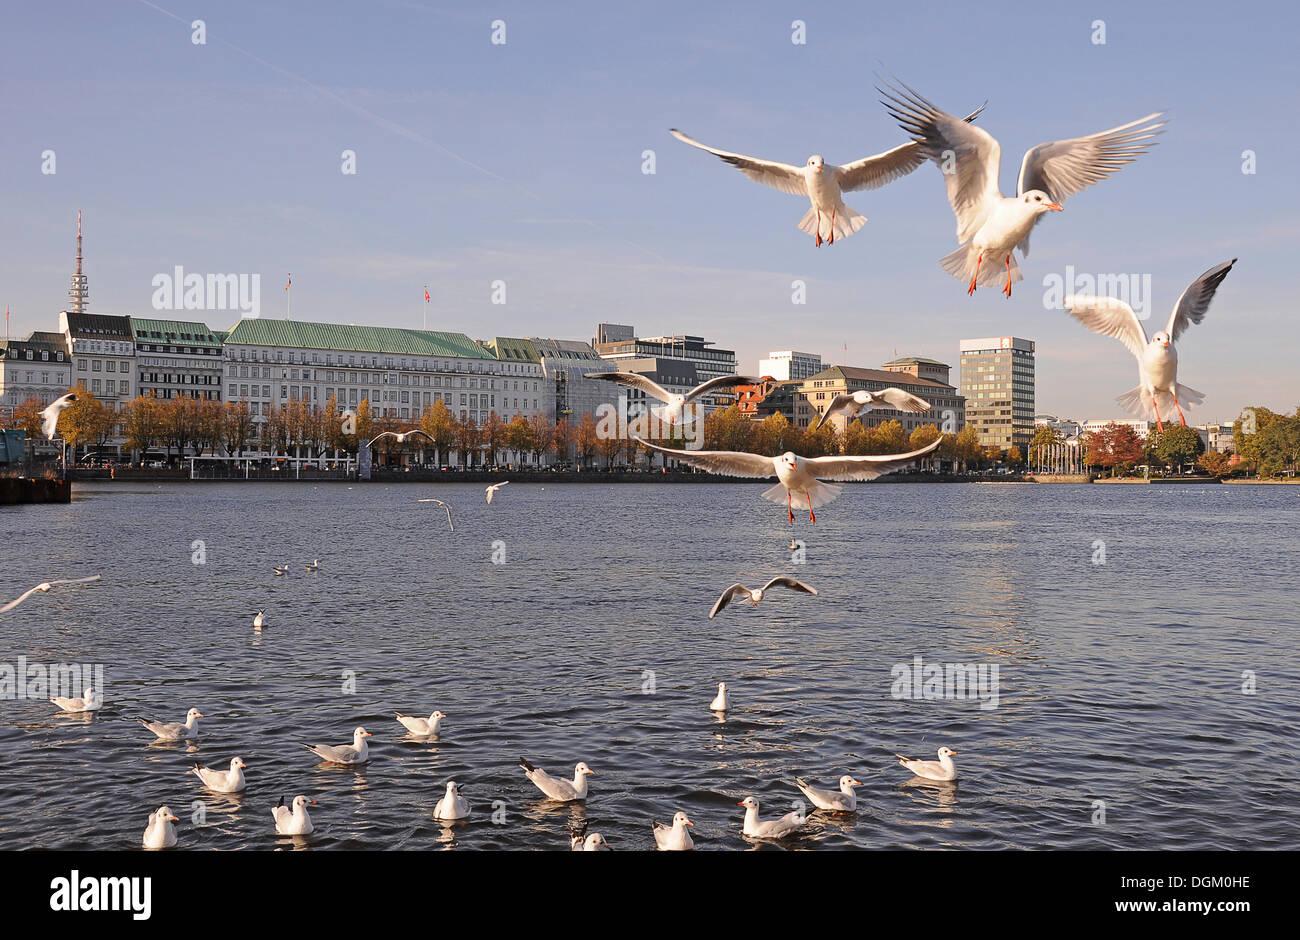 Gulls on the Alster River in Hamburg - Stock Image